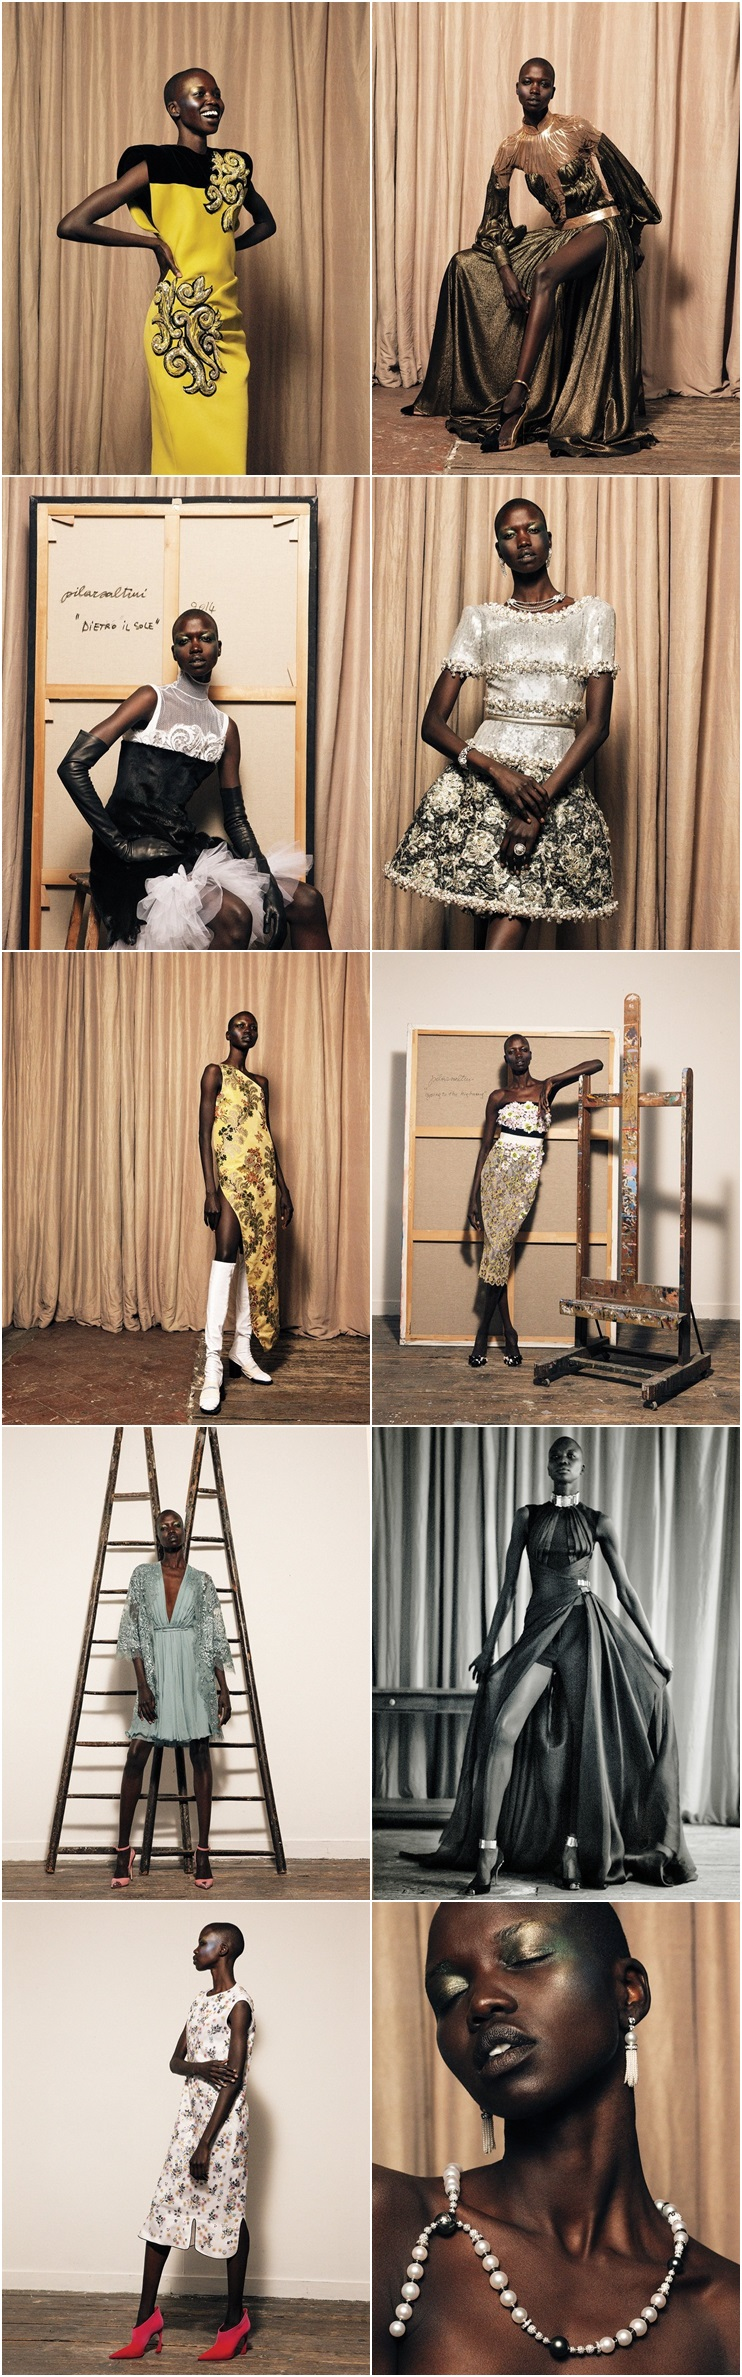 -fashion4addicts.com